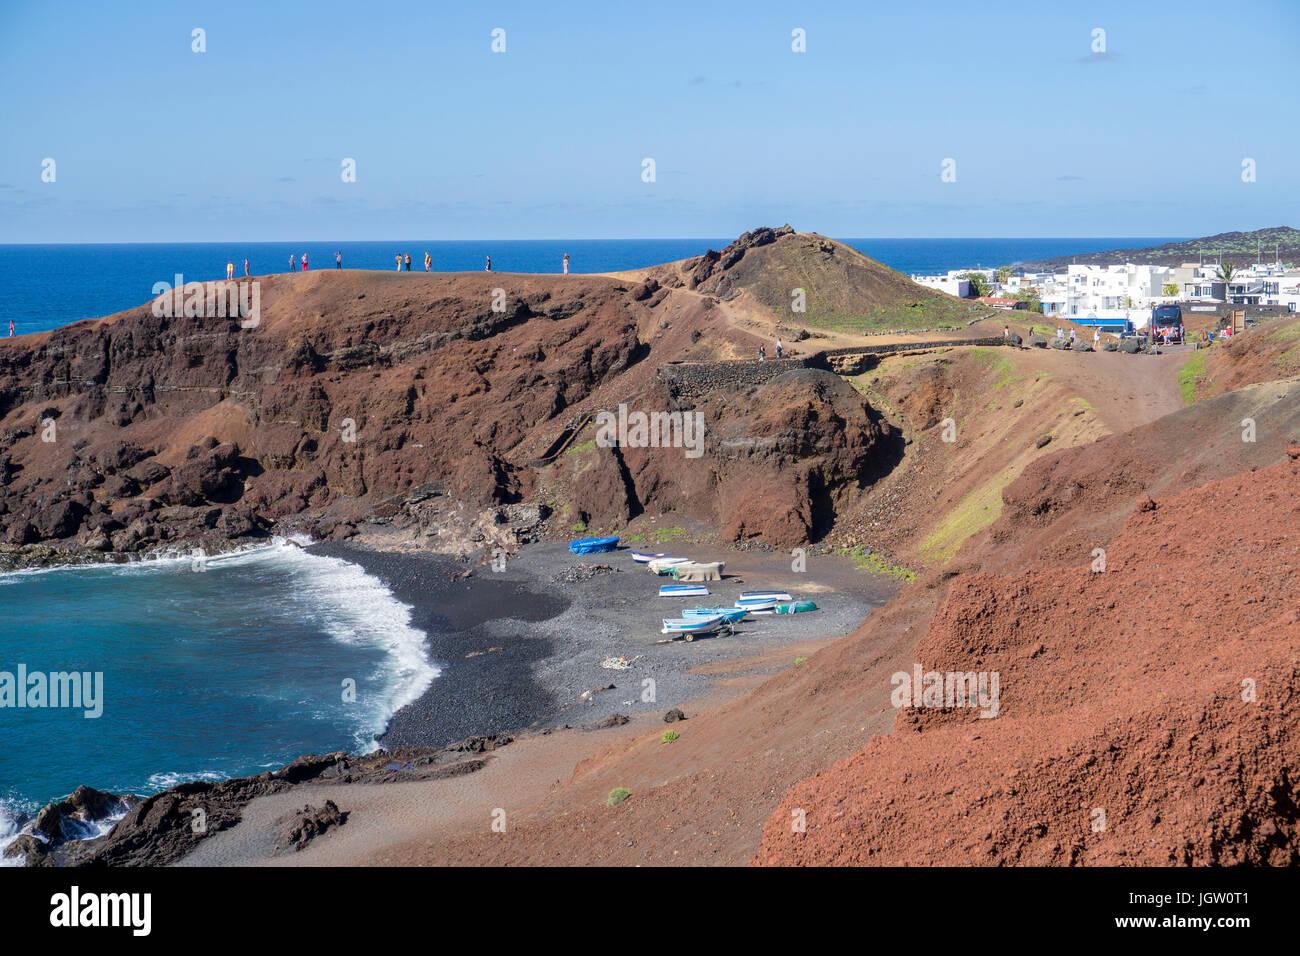 Lava beach at the fishing village El Golfo, Lanzarote island, Canary islands, Spain, Europe - Stock Image